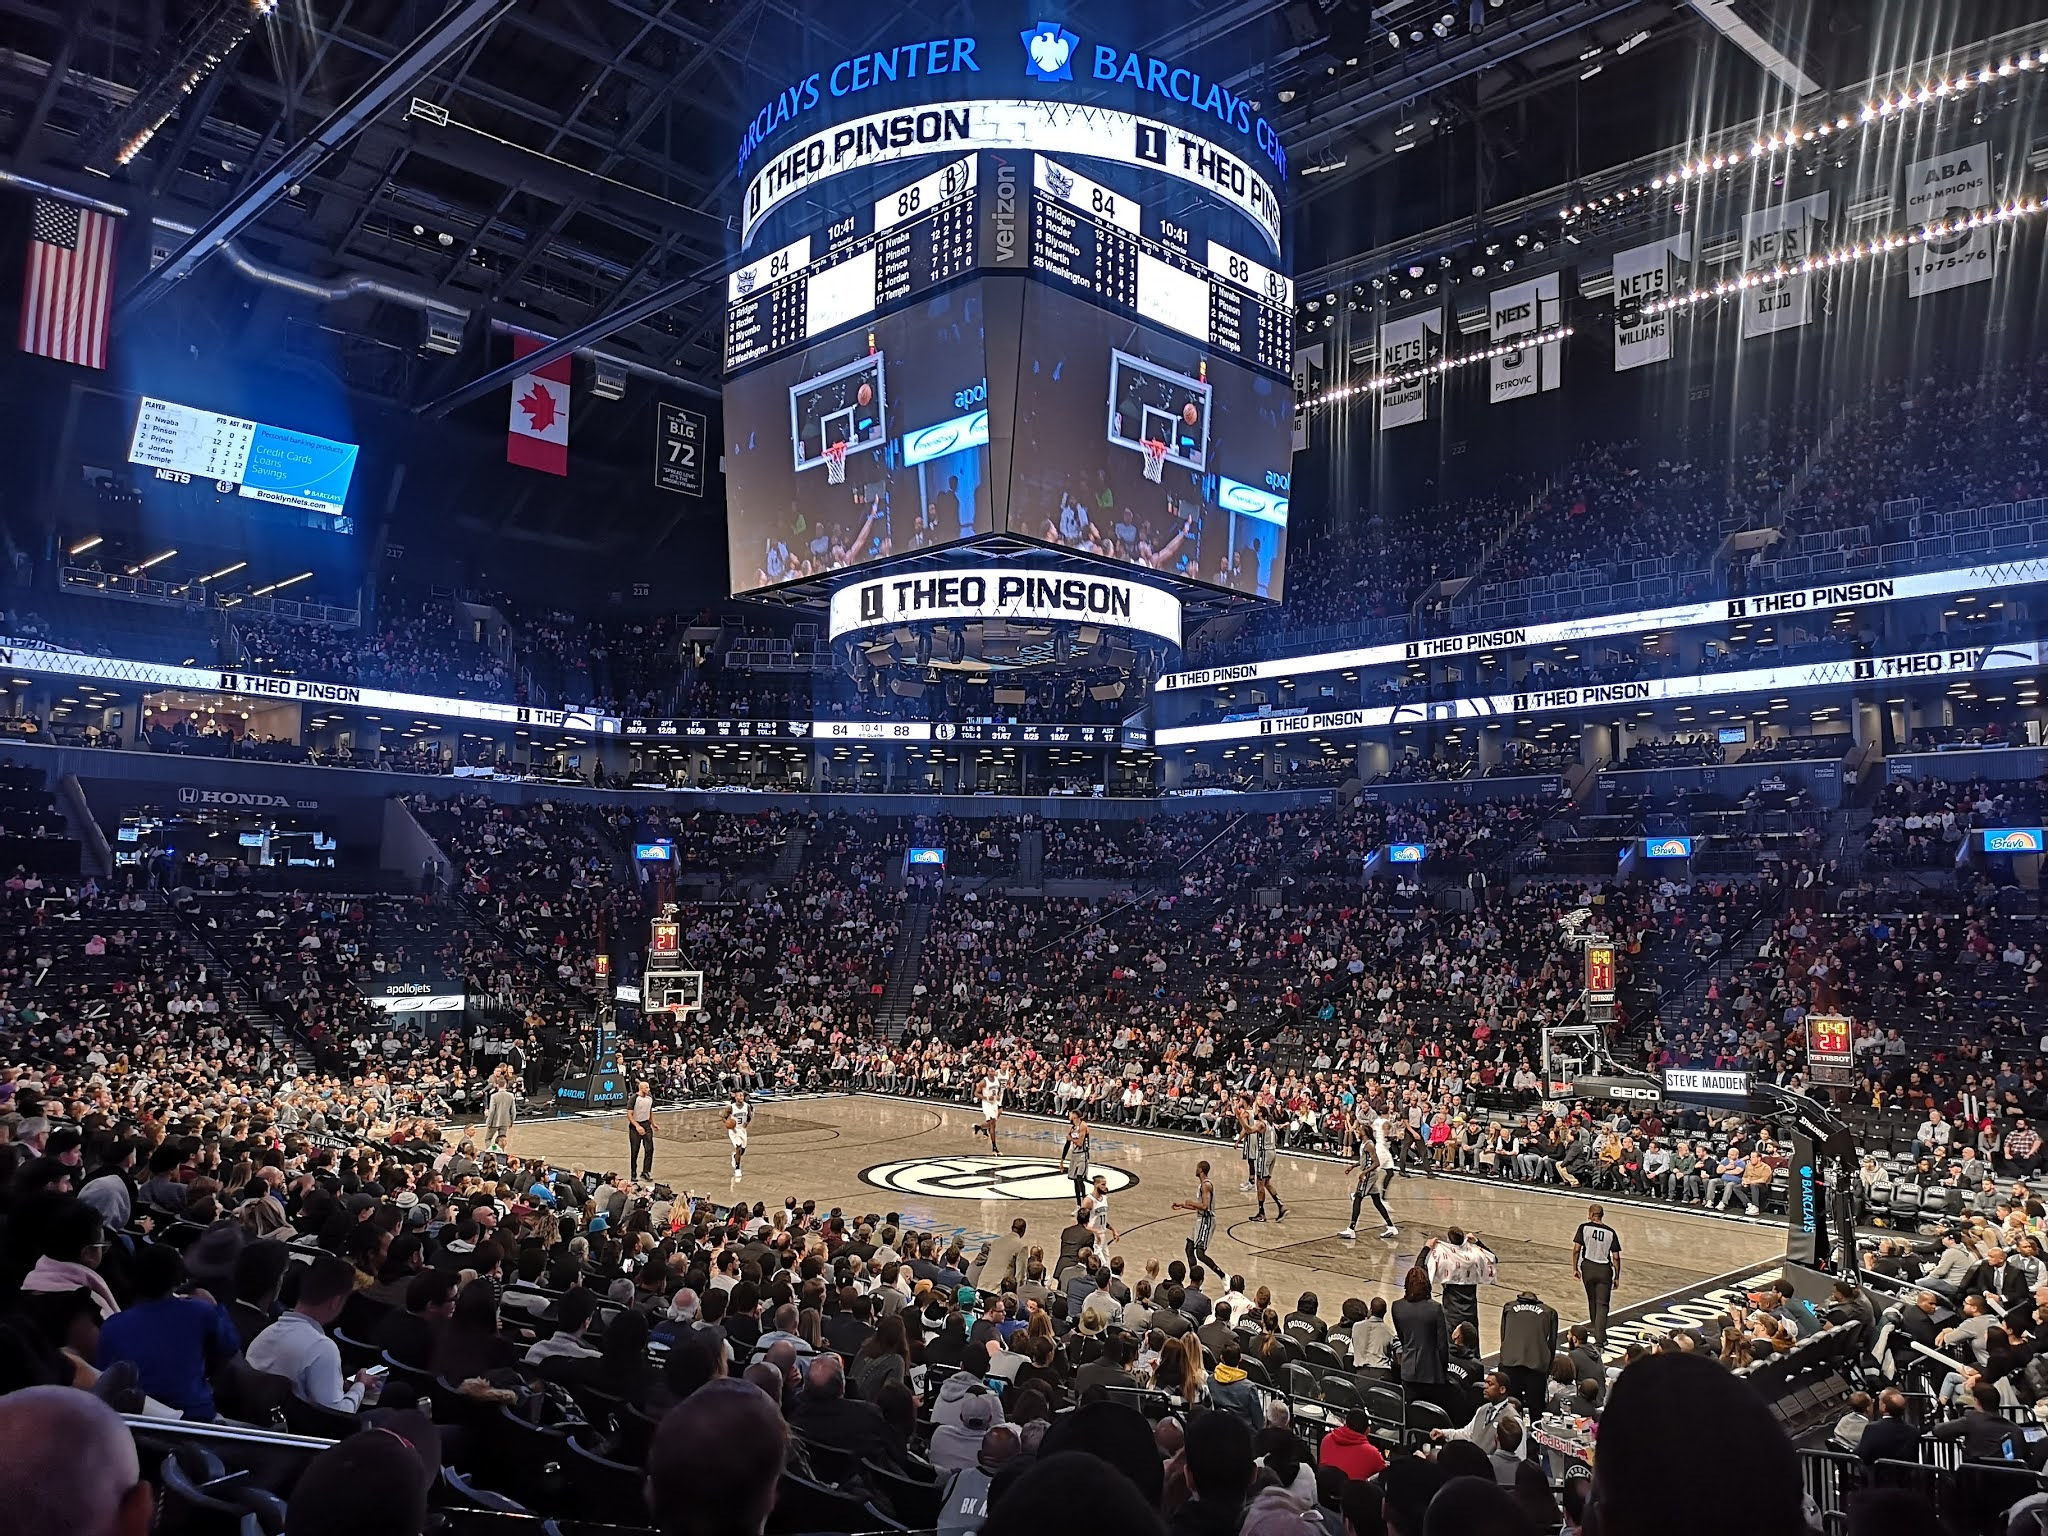 Brooklyn Nets basketball game, Barclays Center